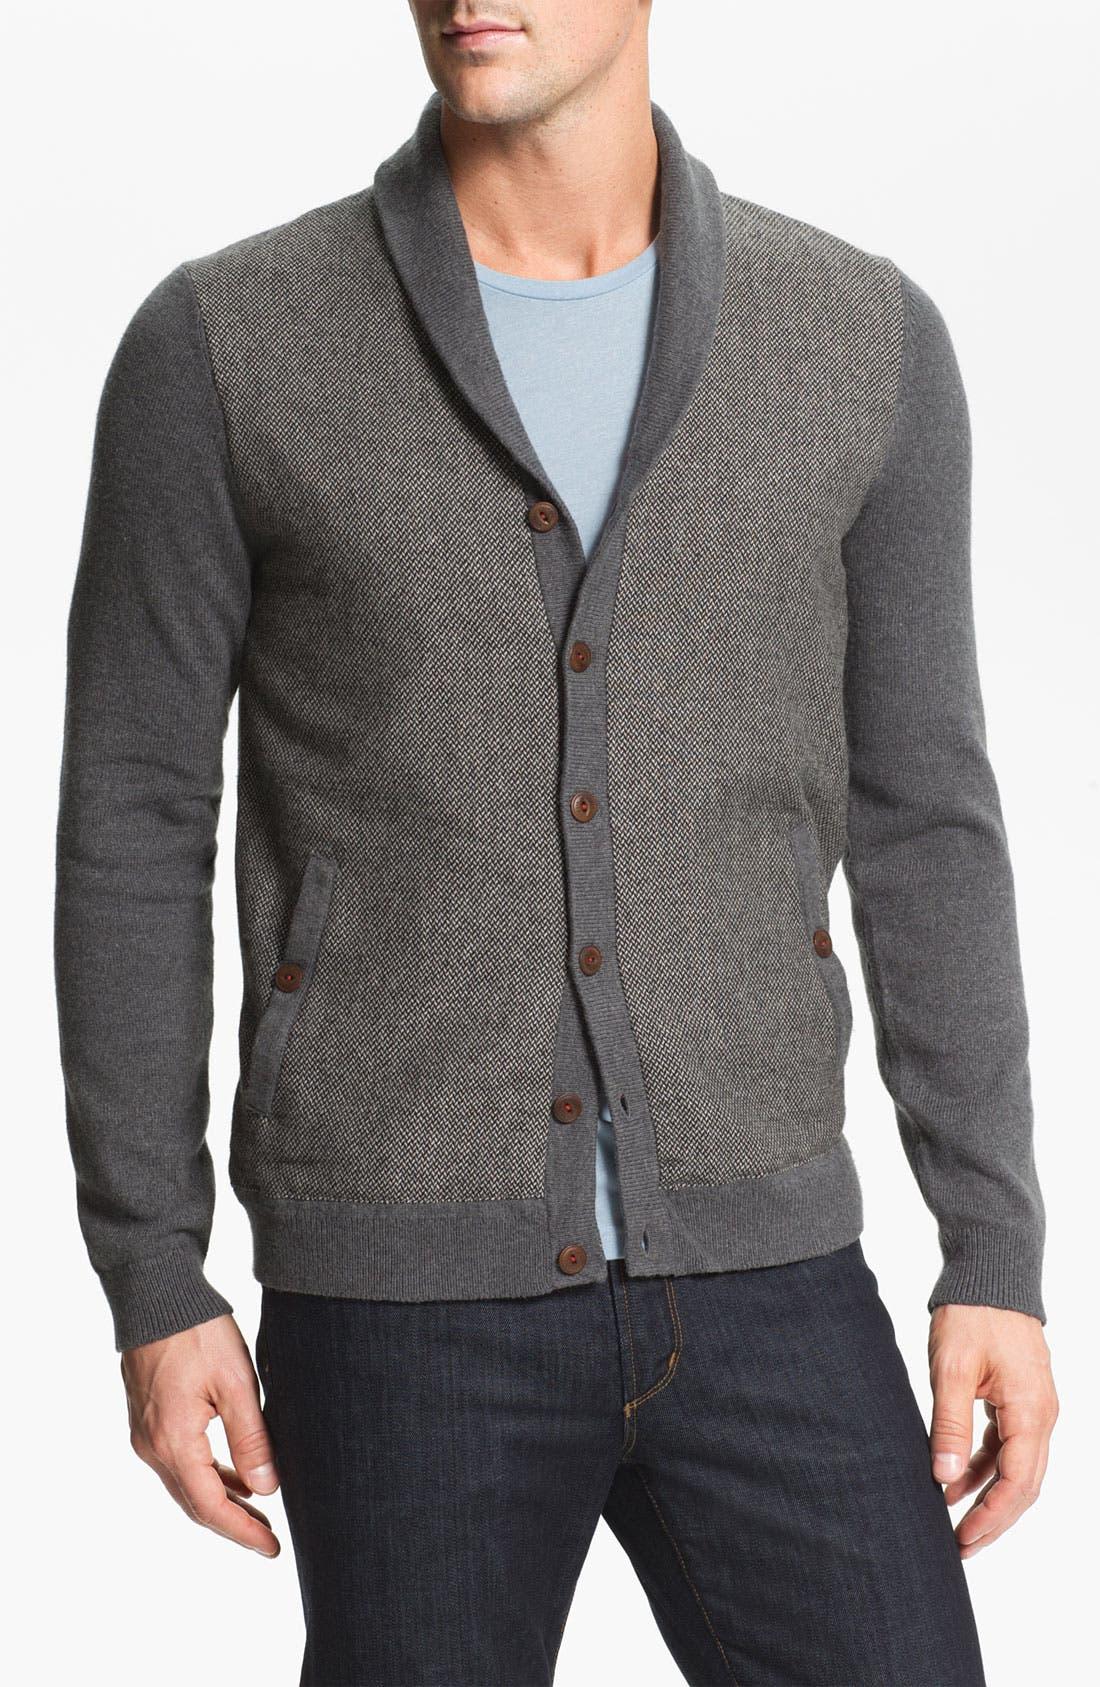 Main Image - Ted Baker London 'Bosport' Shawl Collar Button Cardigan